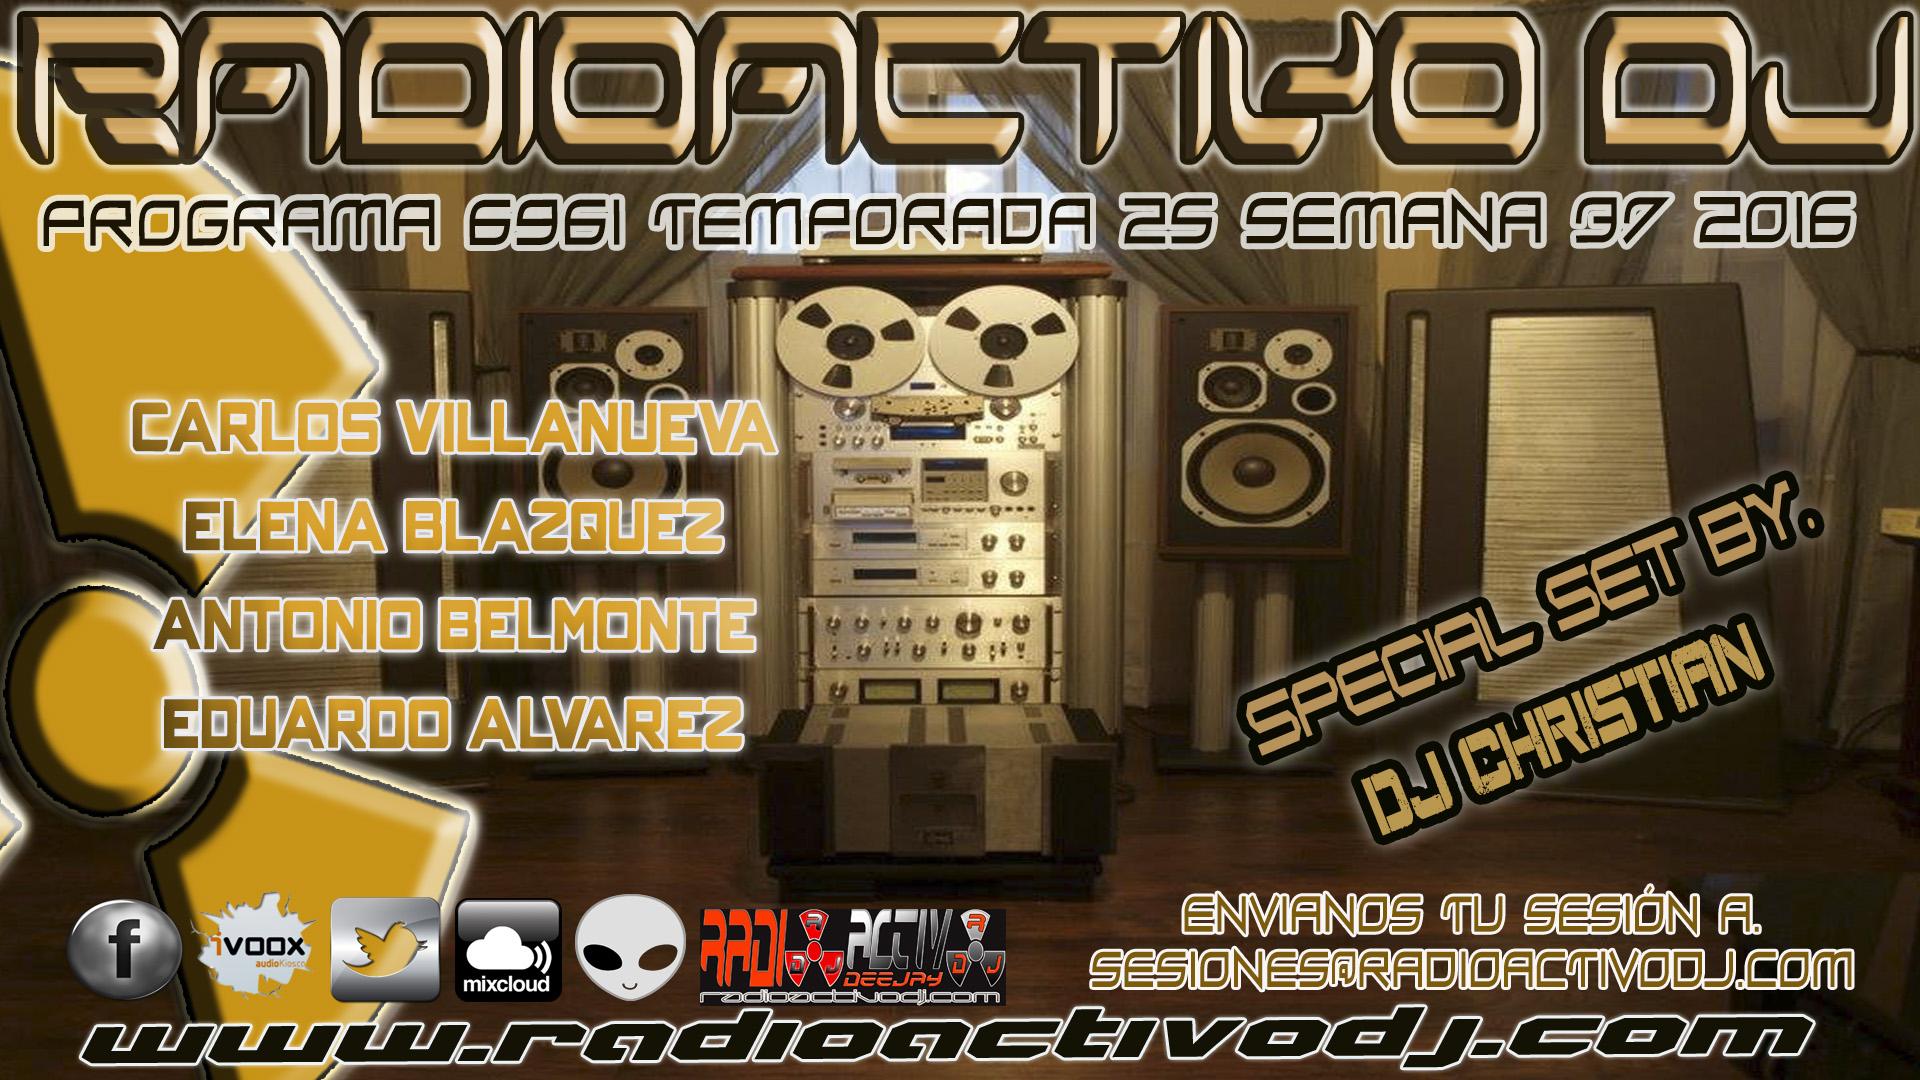 RADIOACTIVO-DJ-37-2016